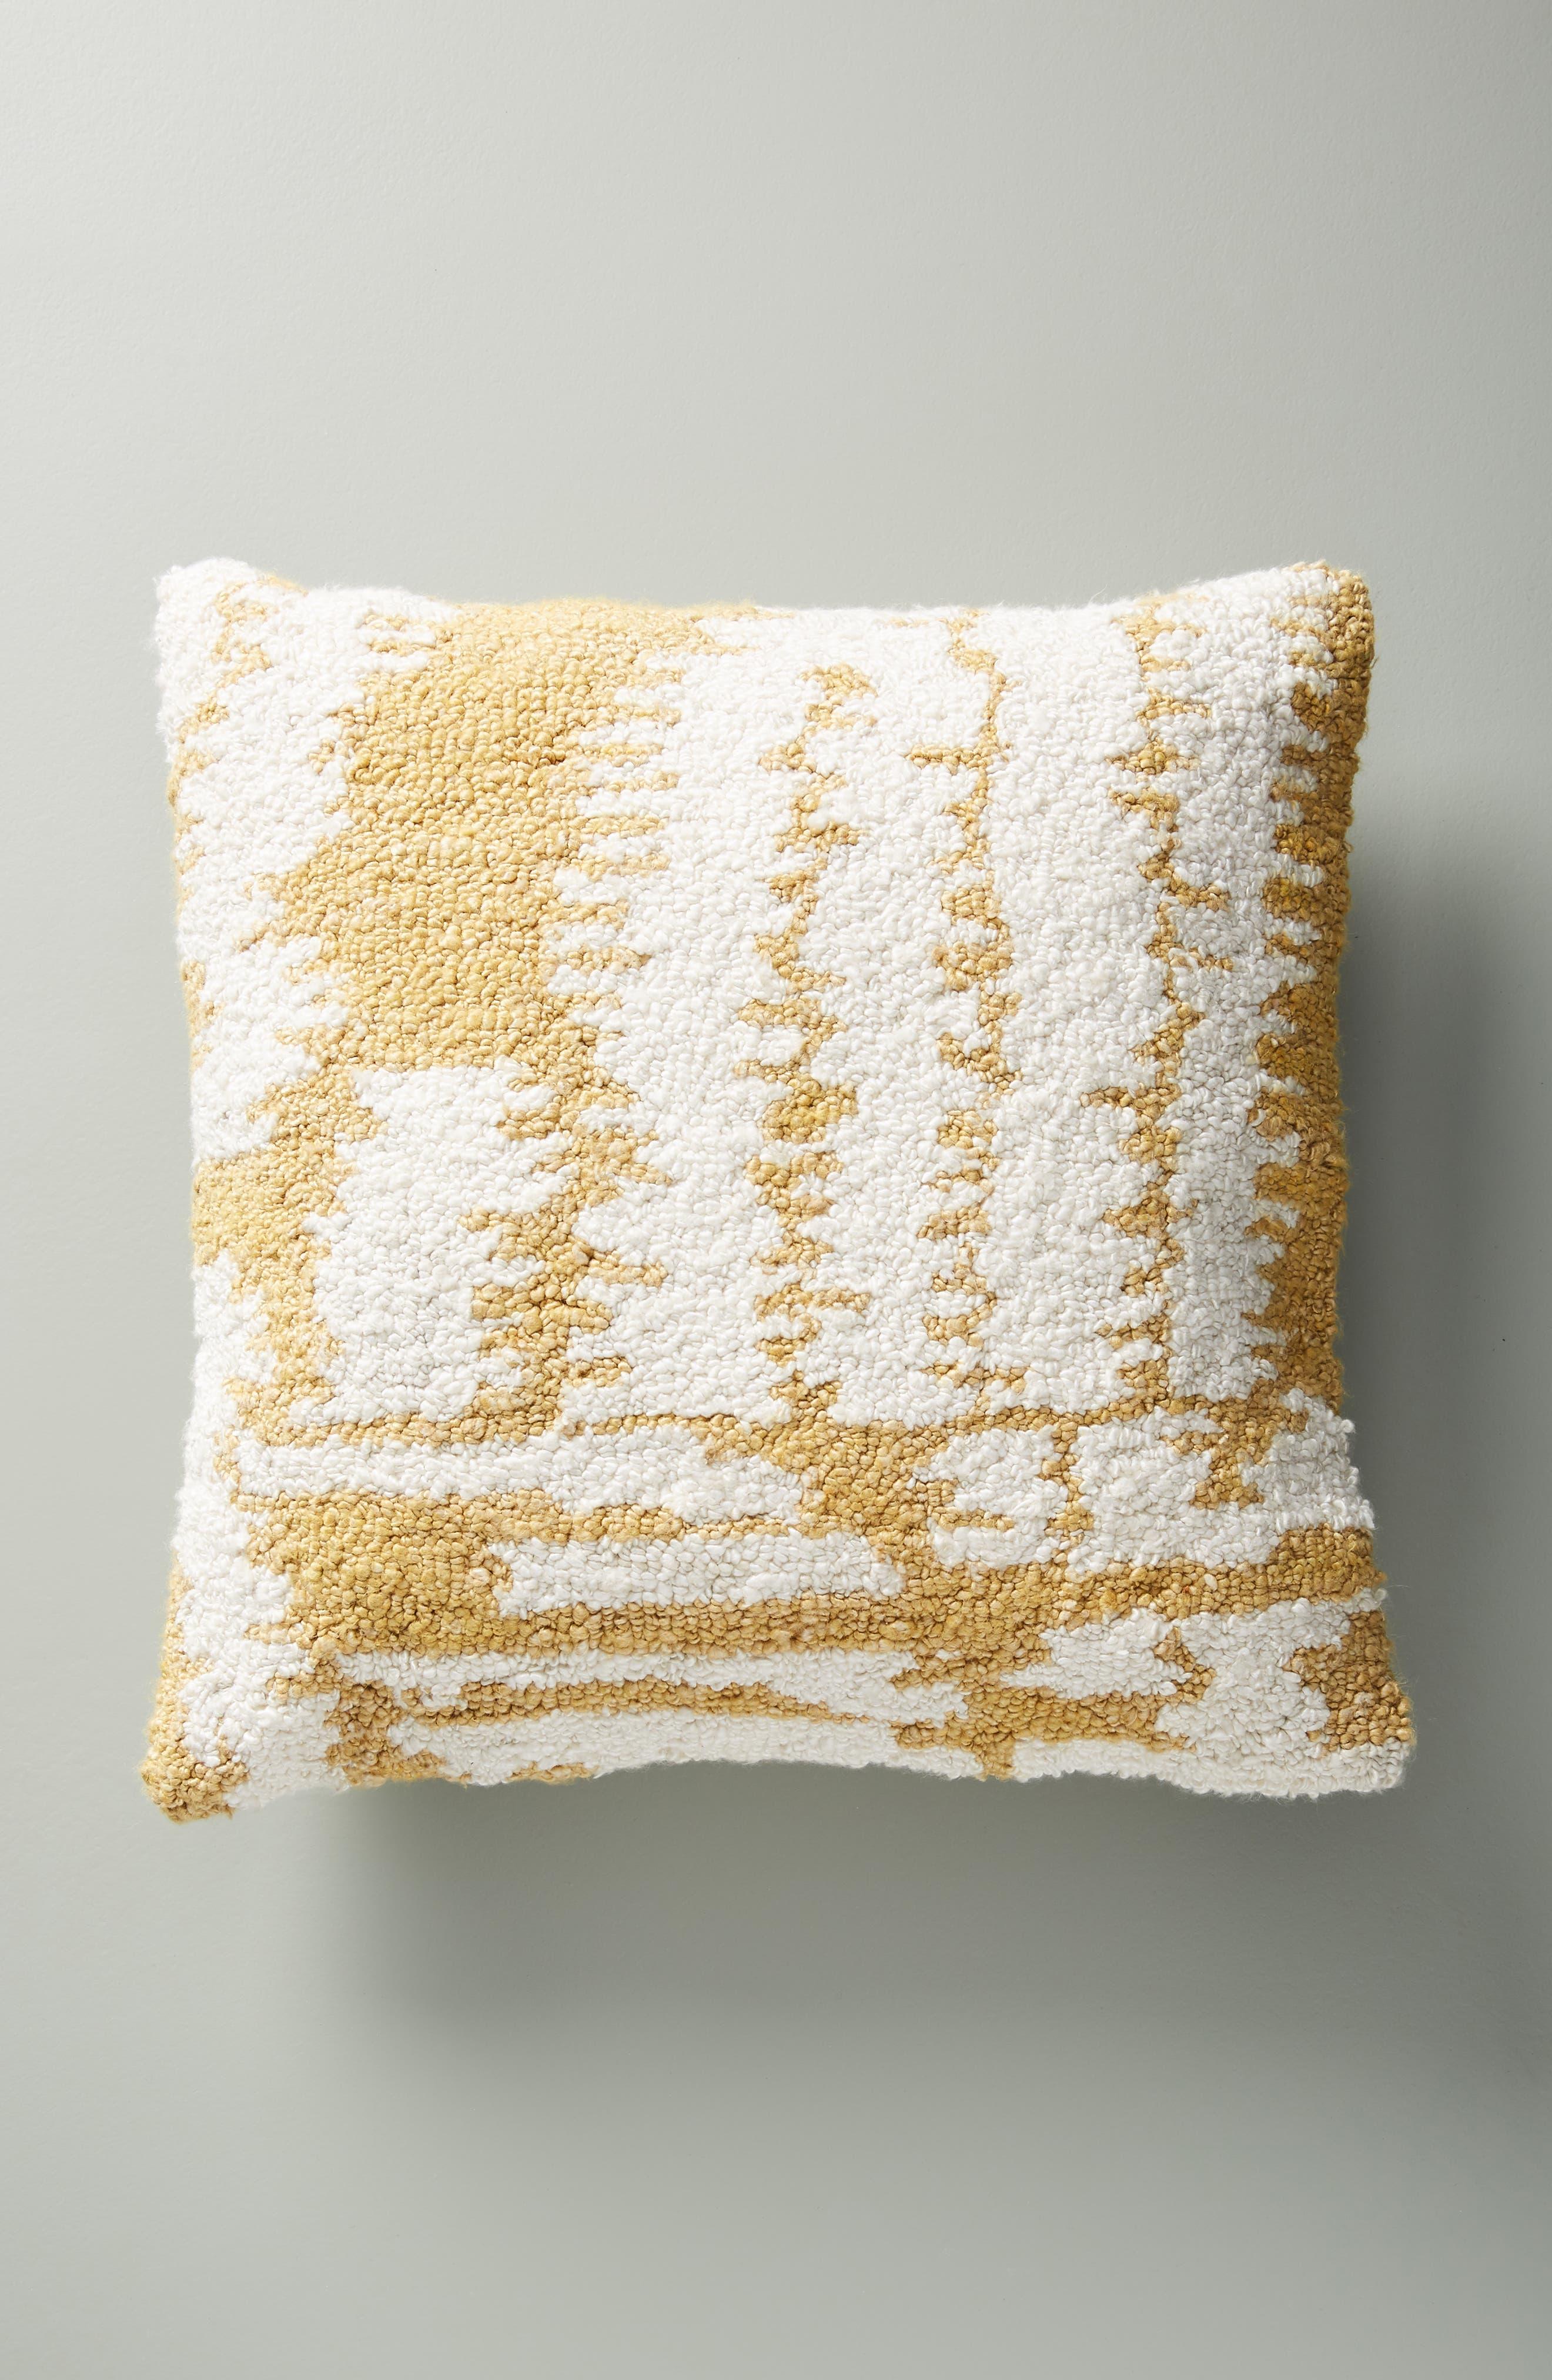 ANTHROPOLOGIE,                             Jordana Accent Pillow,                             Main thumbnail 1, color,                             OCHRE